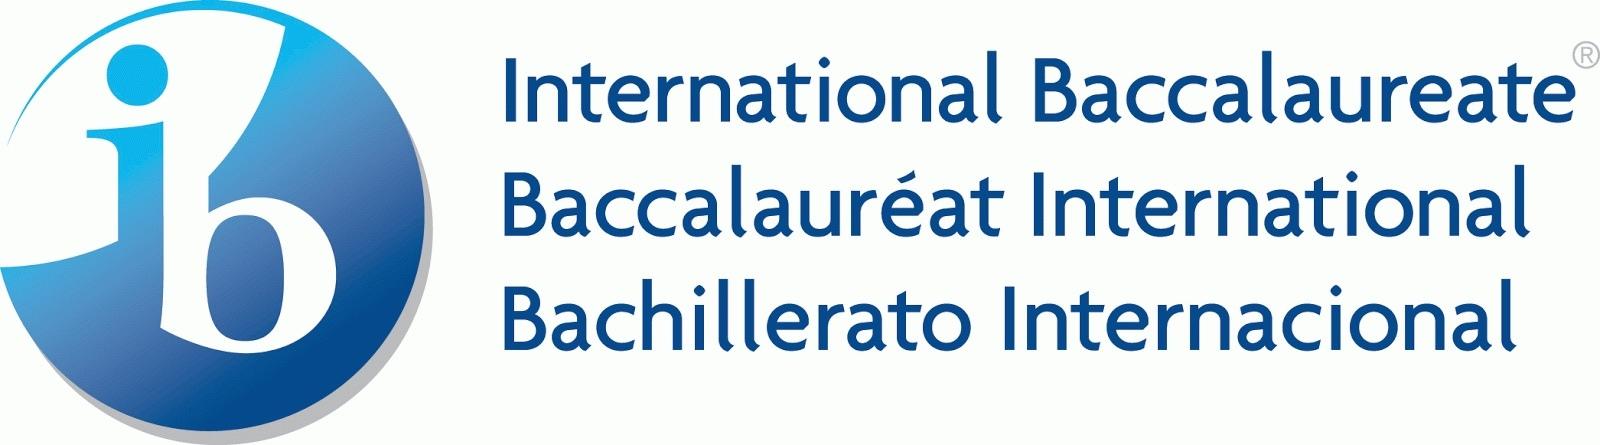 IB(International Baccalaureate)國際文憑課程介紹